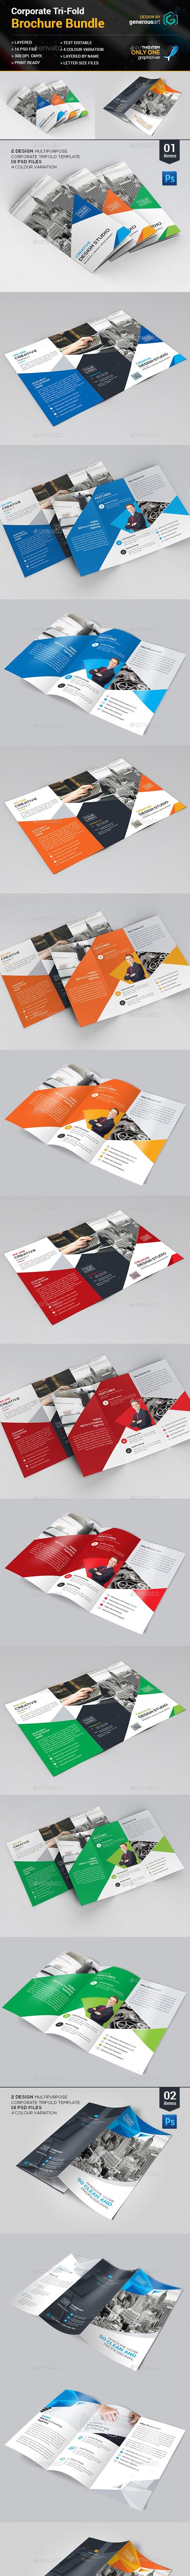 Tri-fold Bundle_2 in 1 - Corporate Brochures